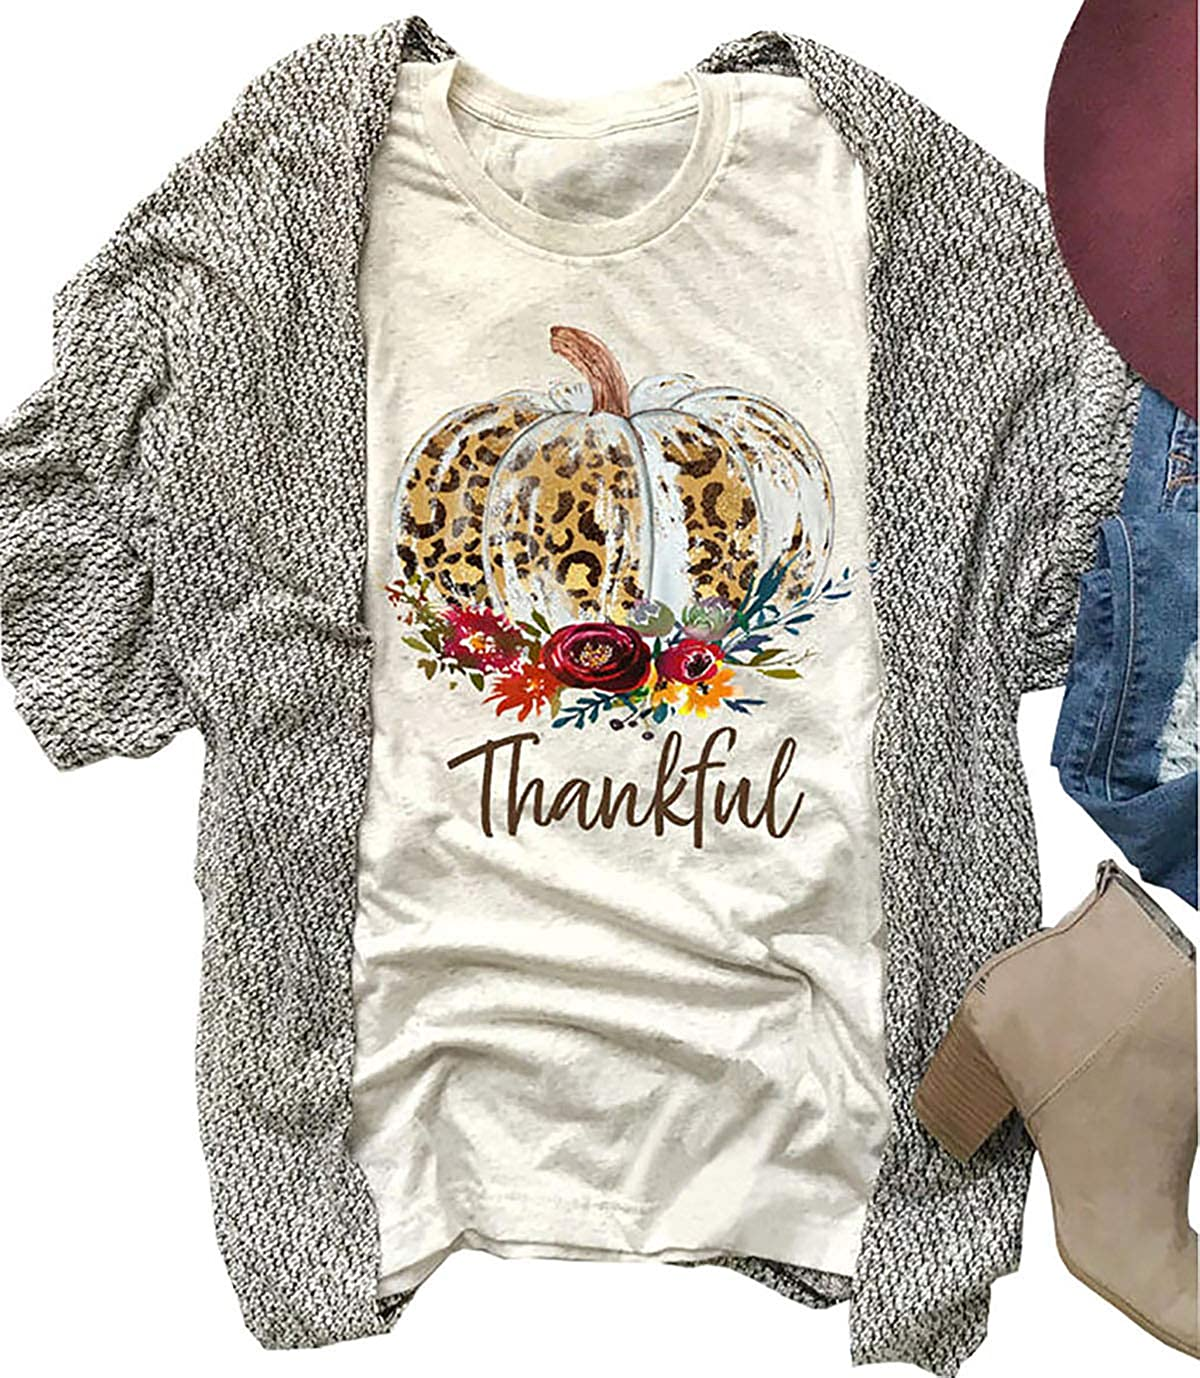 It\u2019s Fall Y\u2019all Women\u2019s T-shirts Sunflower Pumpkin Shirt Thanksgiving Shirt Leopard Pumpkin Shirt Ladies Fall Shirt